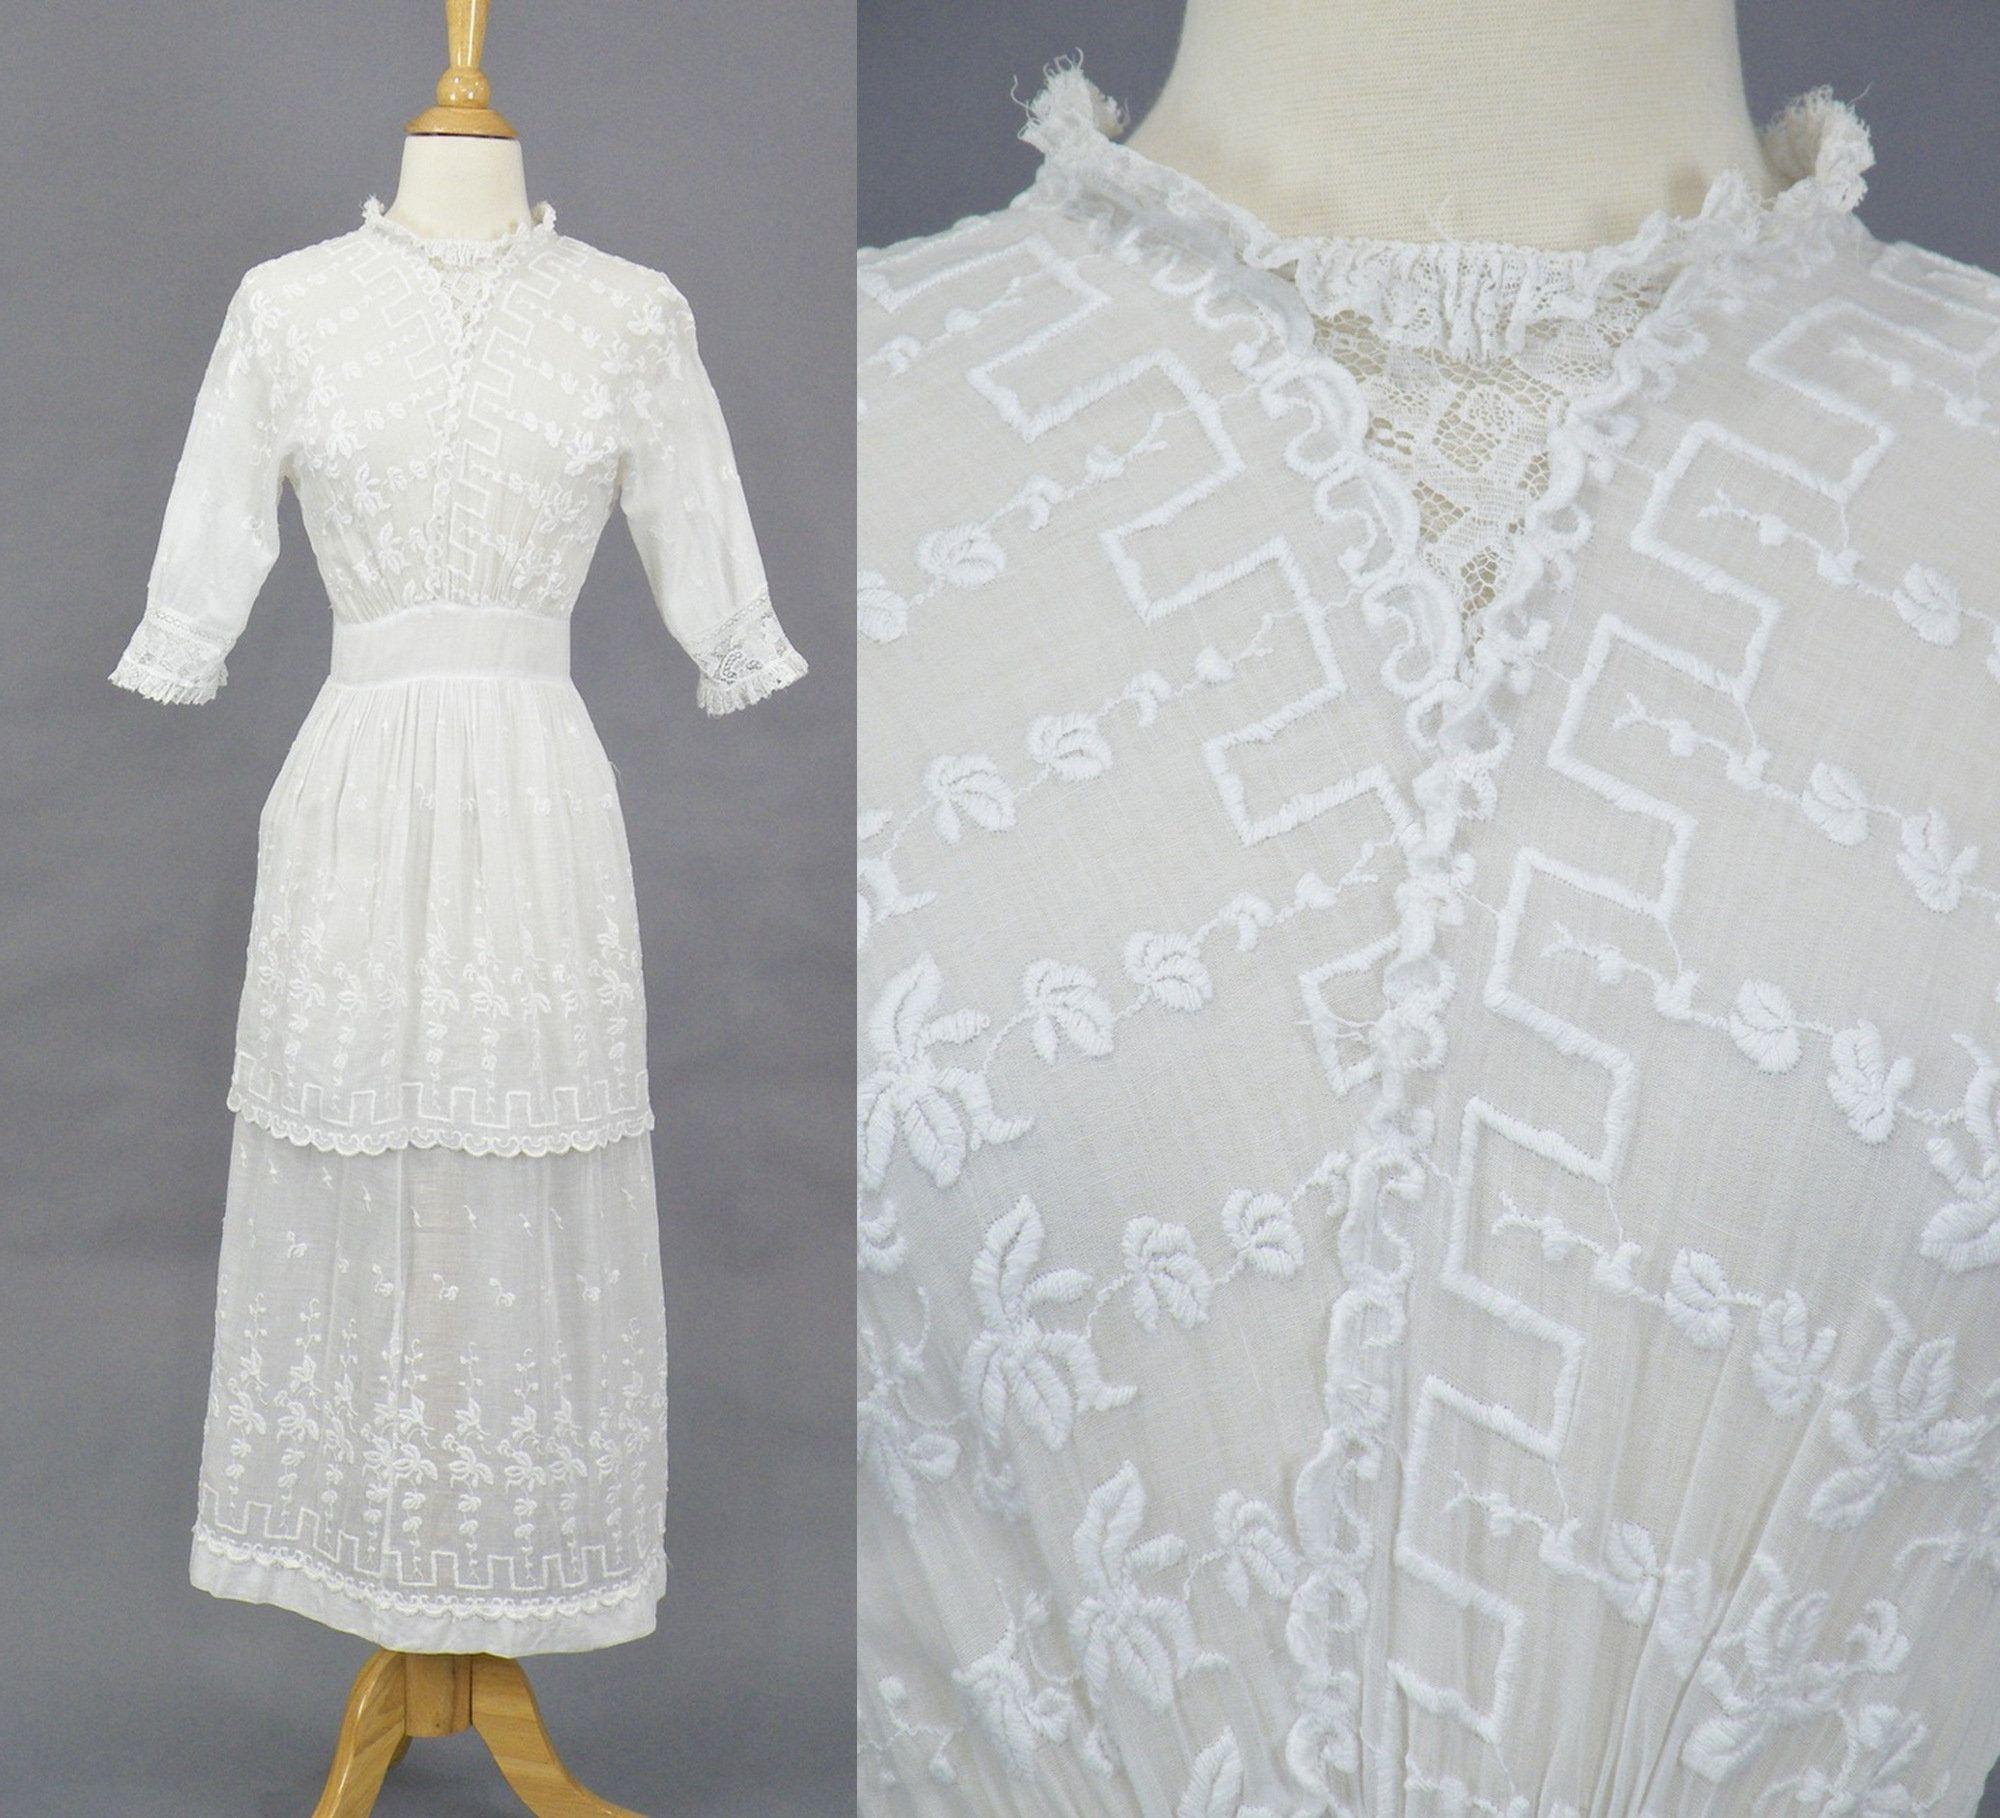 Antique white edwardian tea dress embroidered s cotton lace